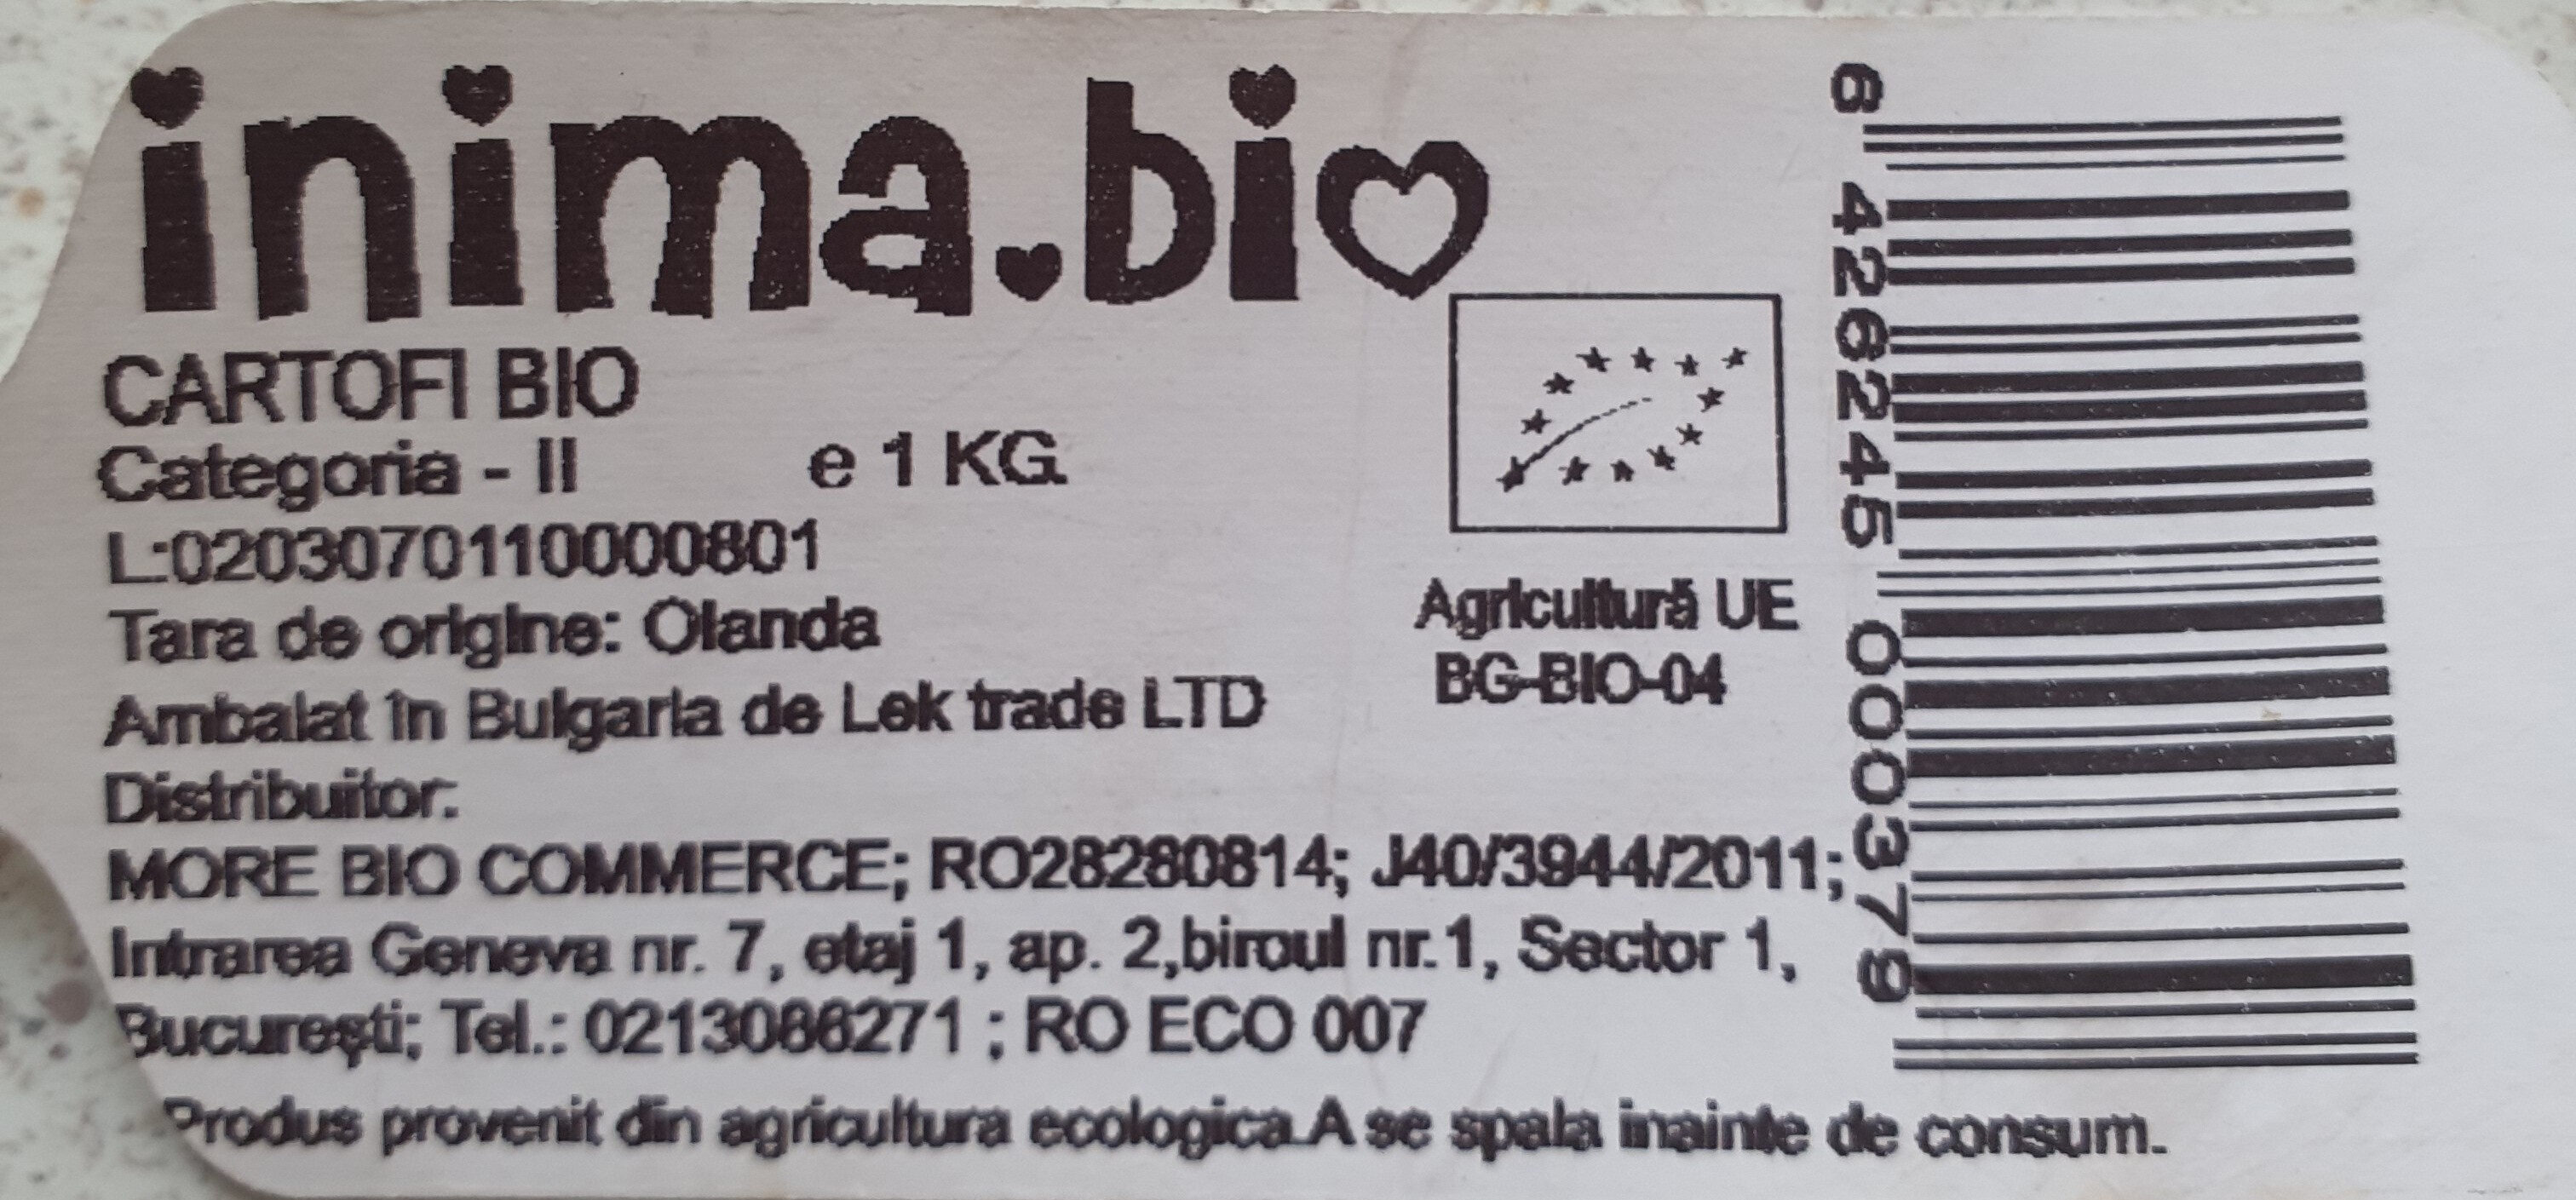 Cartofi Bio - Product - en